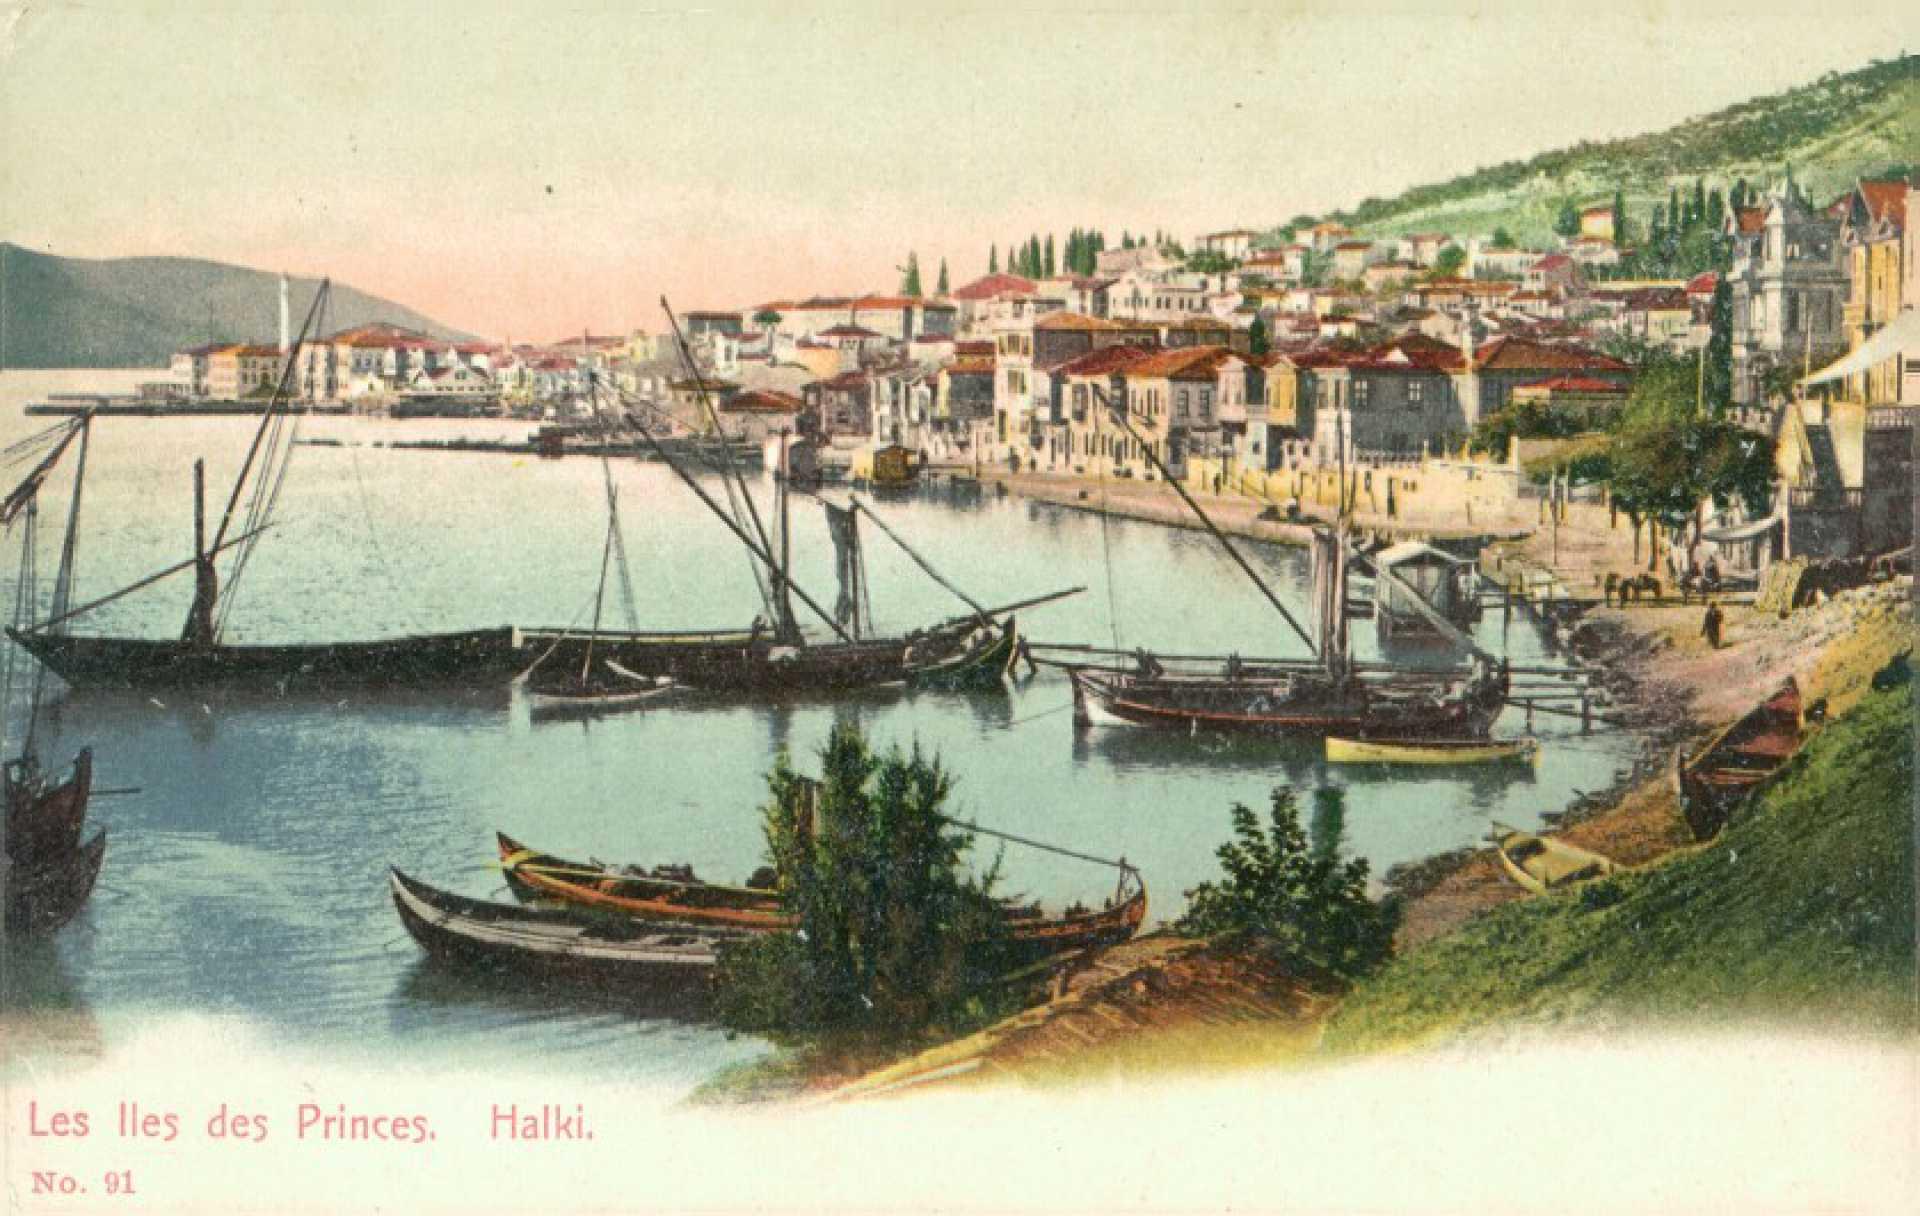 Les Iles des Princes. Halki No. 91